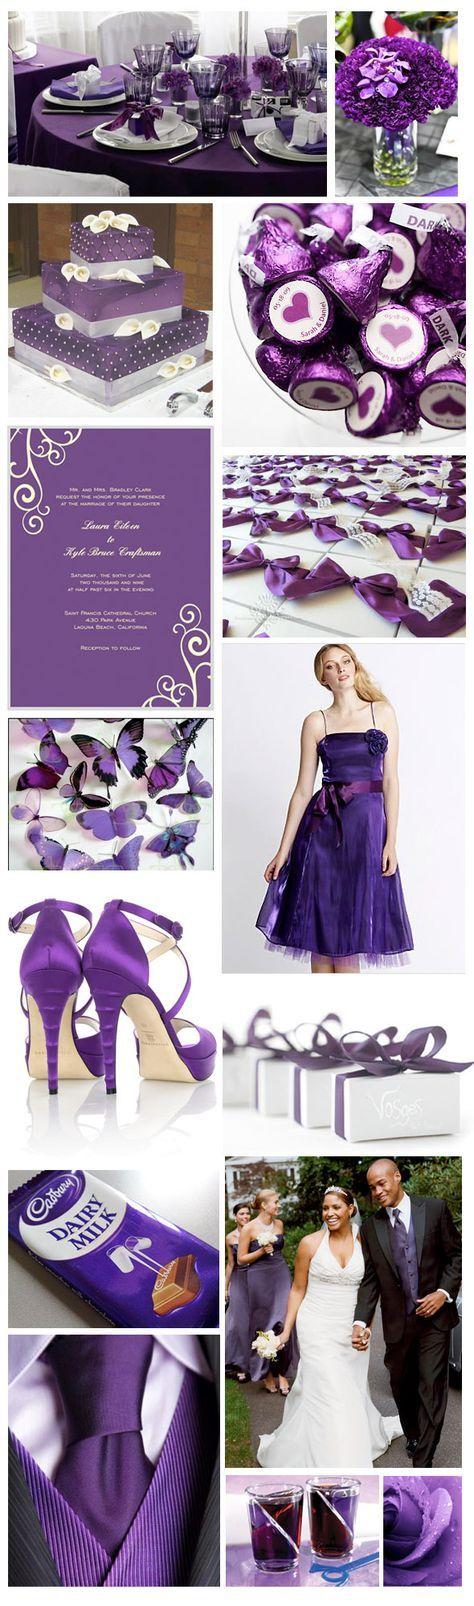 #Purple #Wedding Theme Inspiration and Ideas